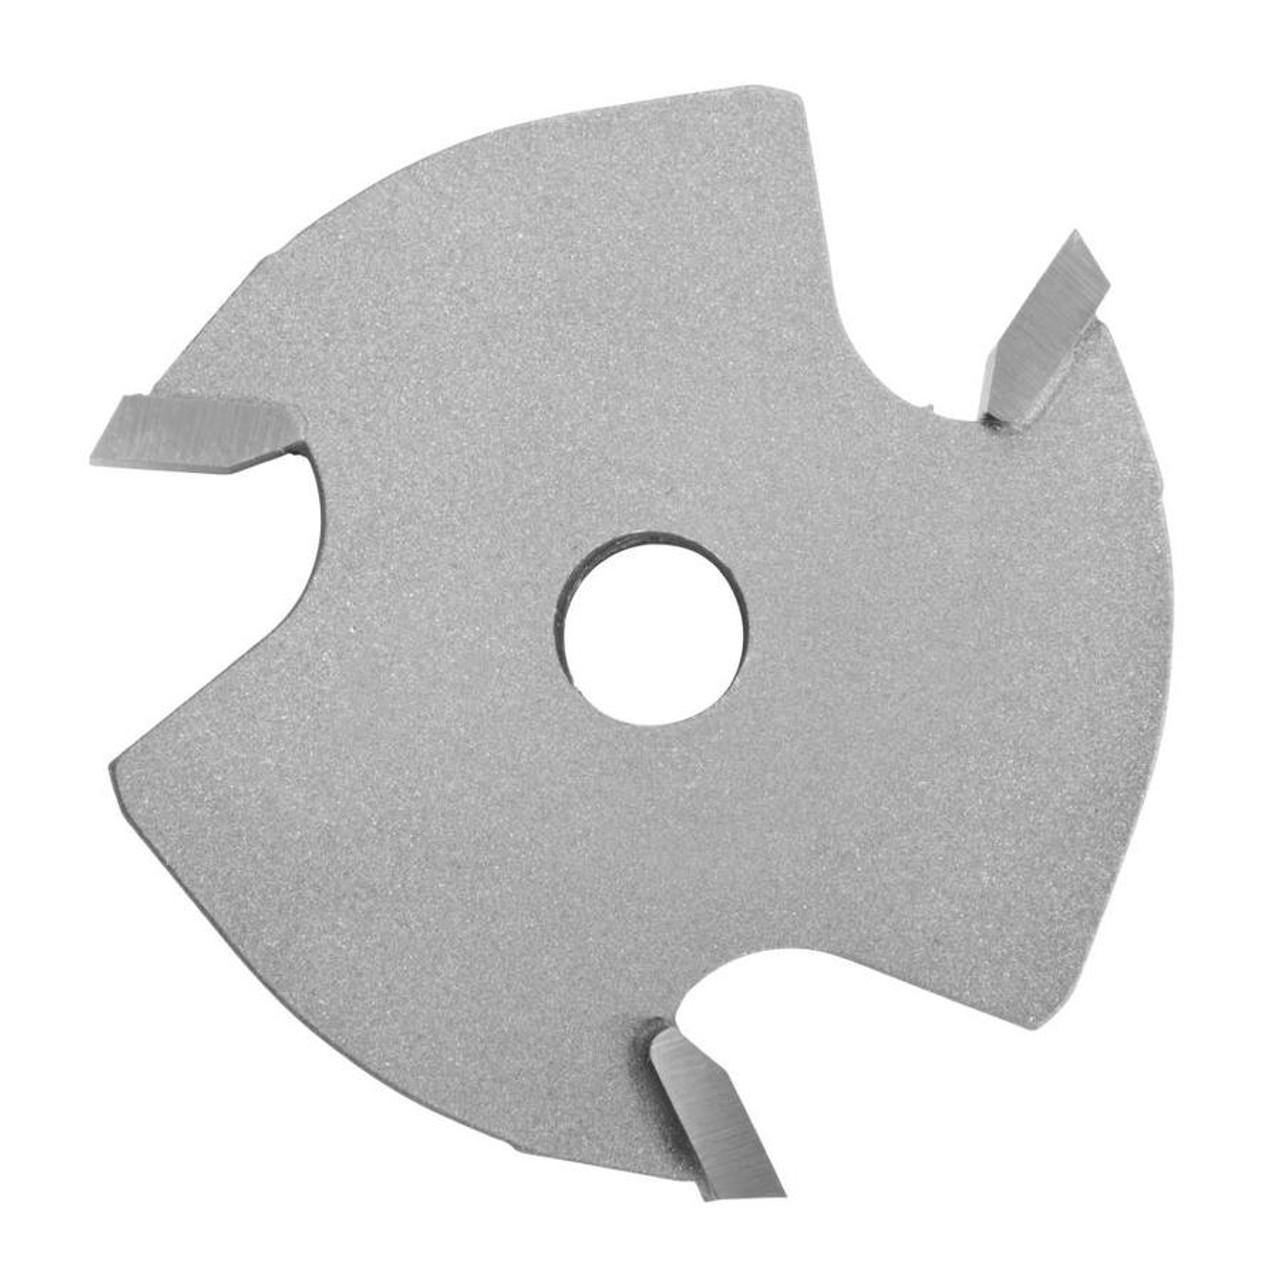 3 Wing Countersink Slot Cutter  093 Kerf (3/32)